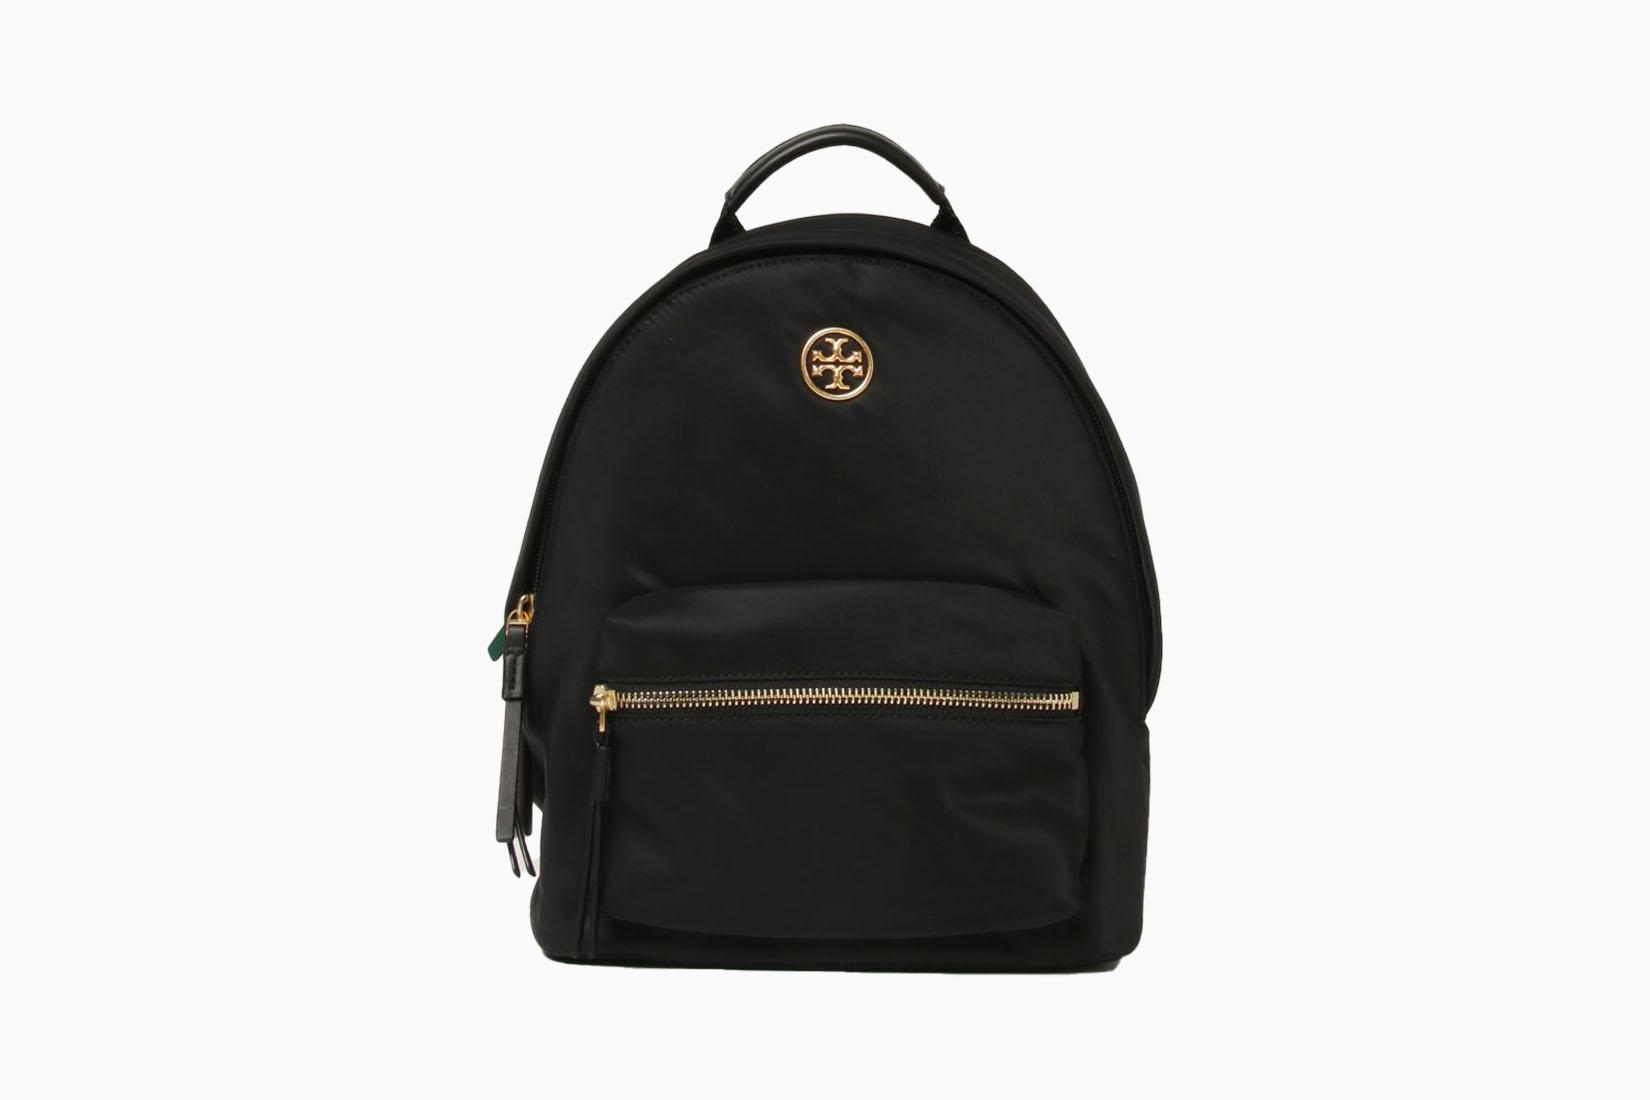 best backpacks women tory burch review Luxe Digital